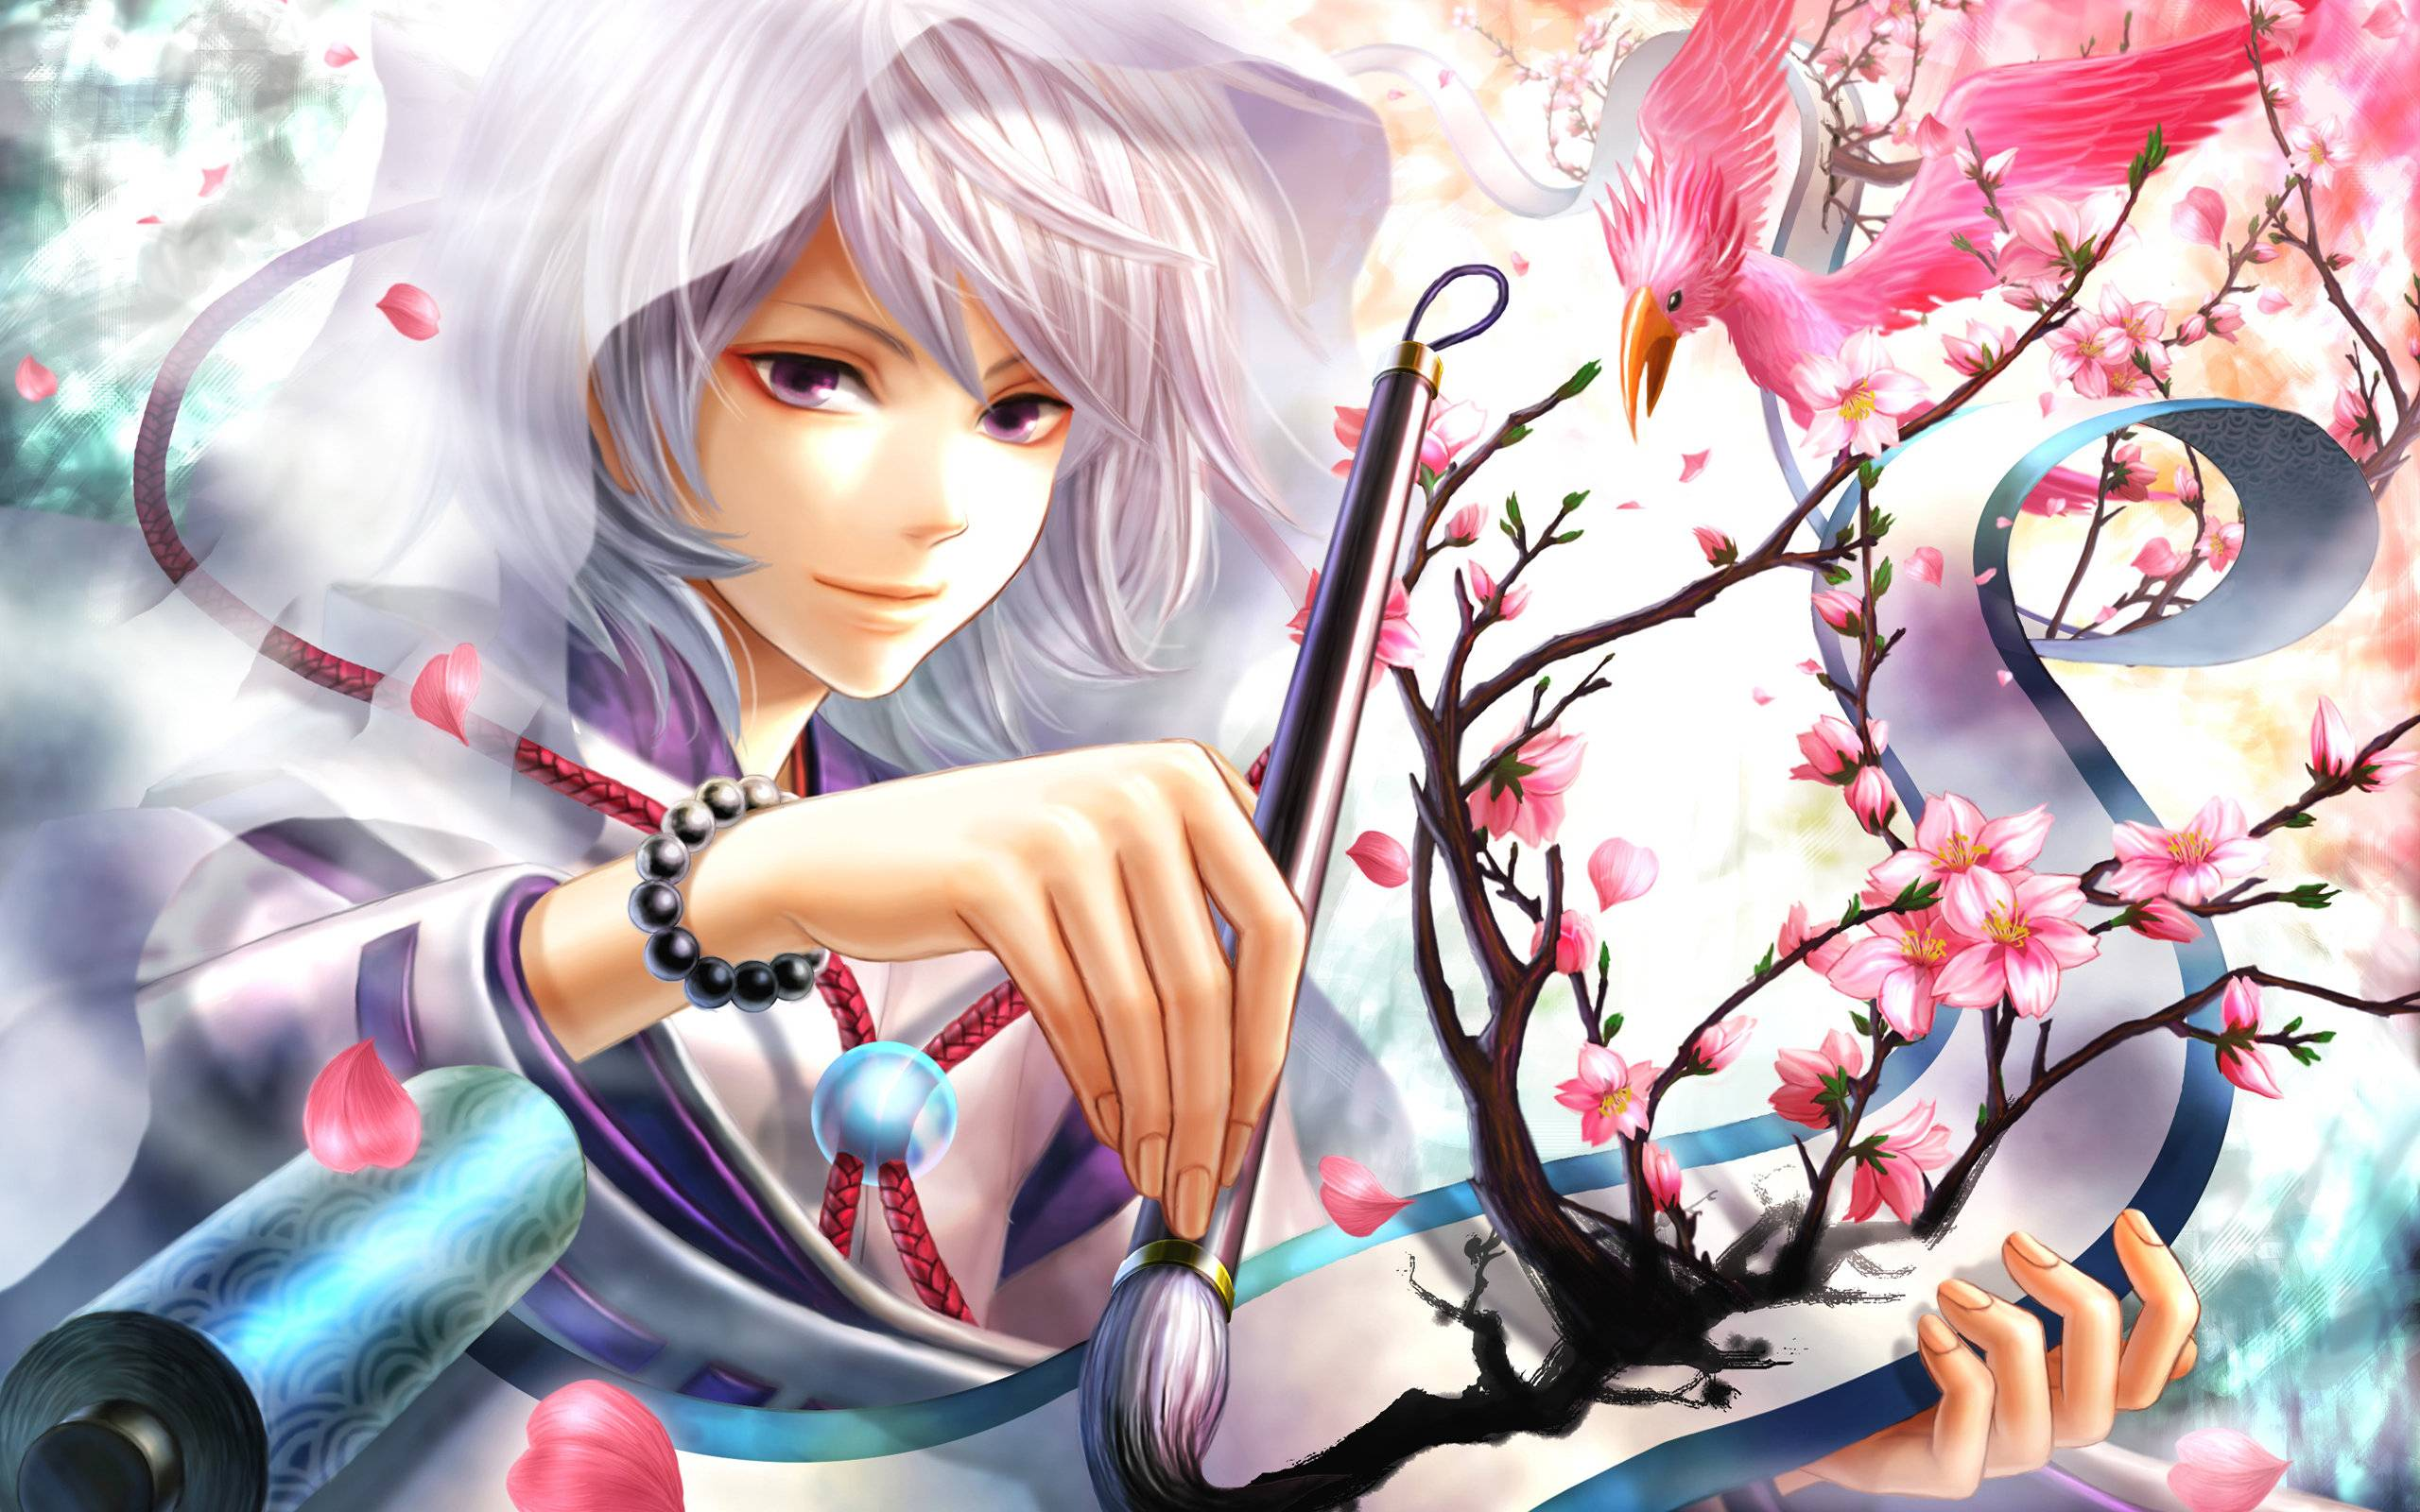 wallpaper hd girls Anime